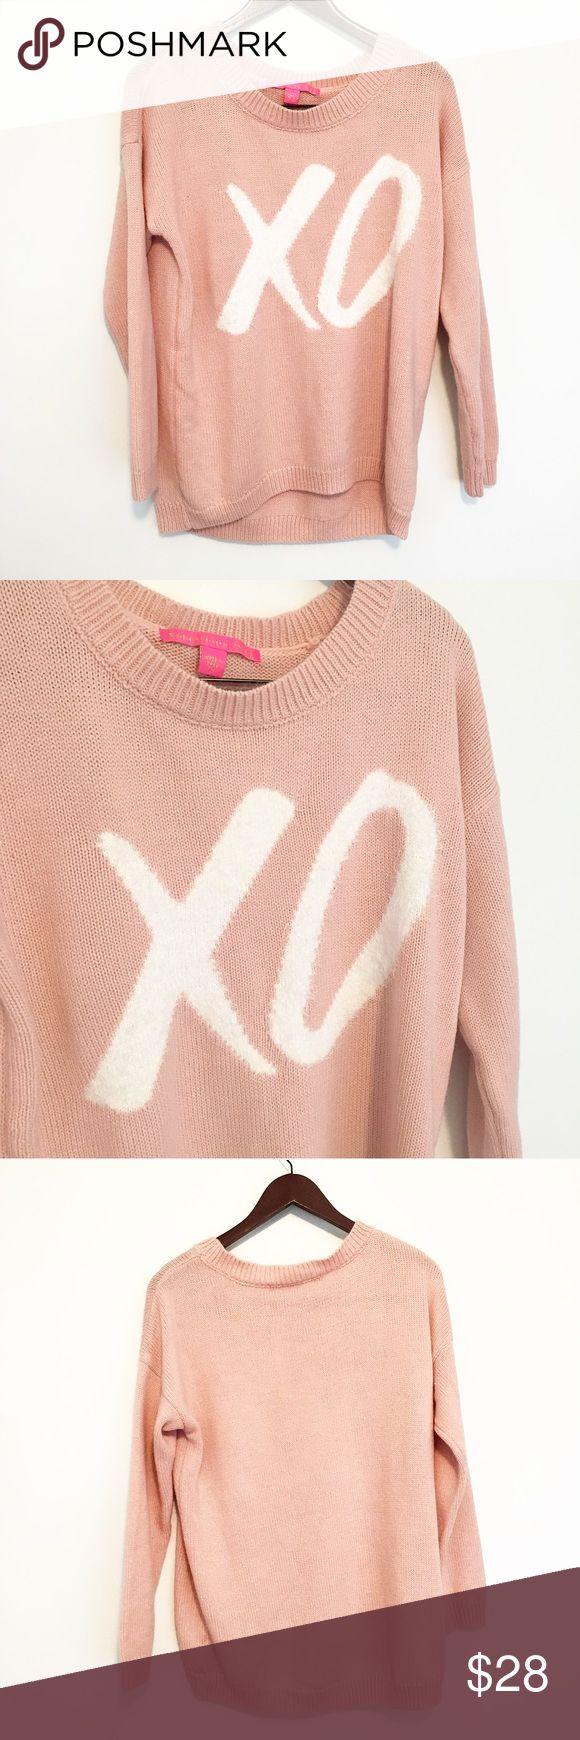 Selling this Blush Pink/Dusty Rose XO Sweater Rebellious One on Poshmark! My username is: closetcrisistx. #shopmycloset #poshmark #fashion #shopping #style #forsale #Rebellious One #Sweaters